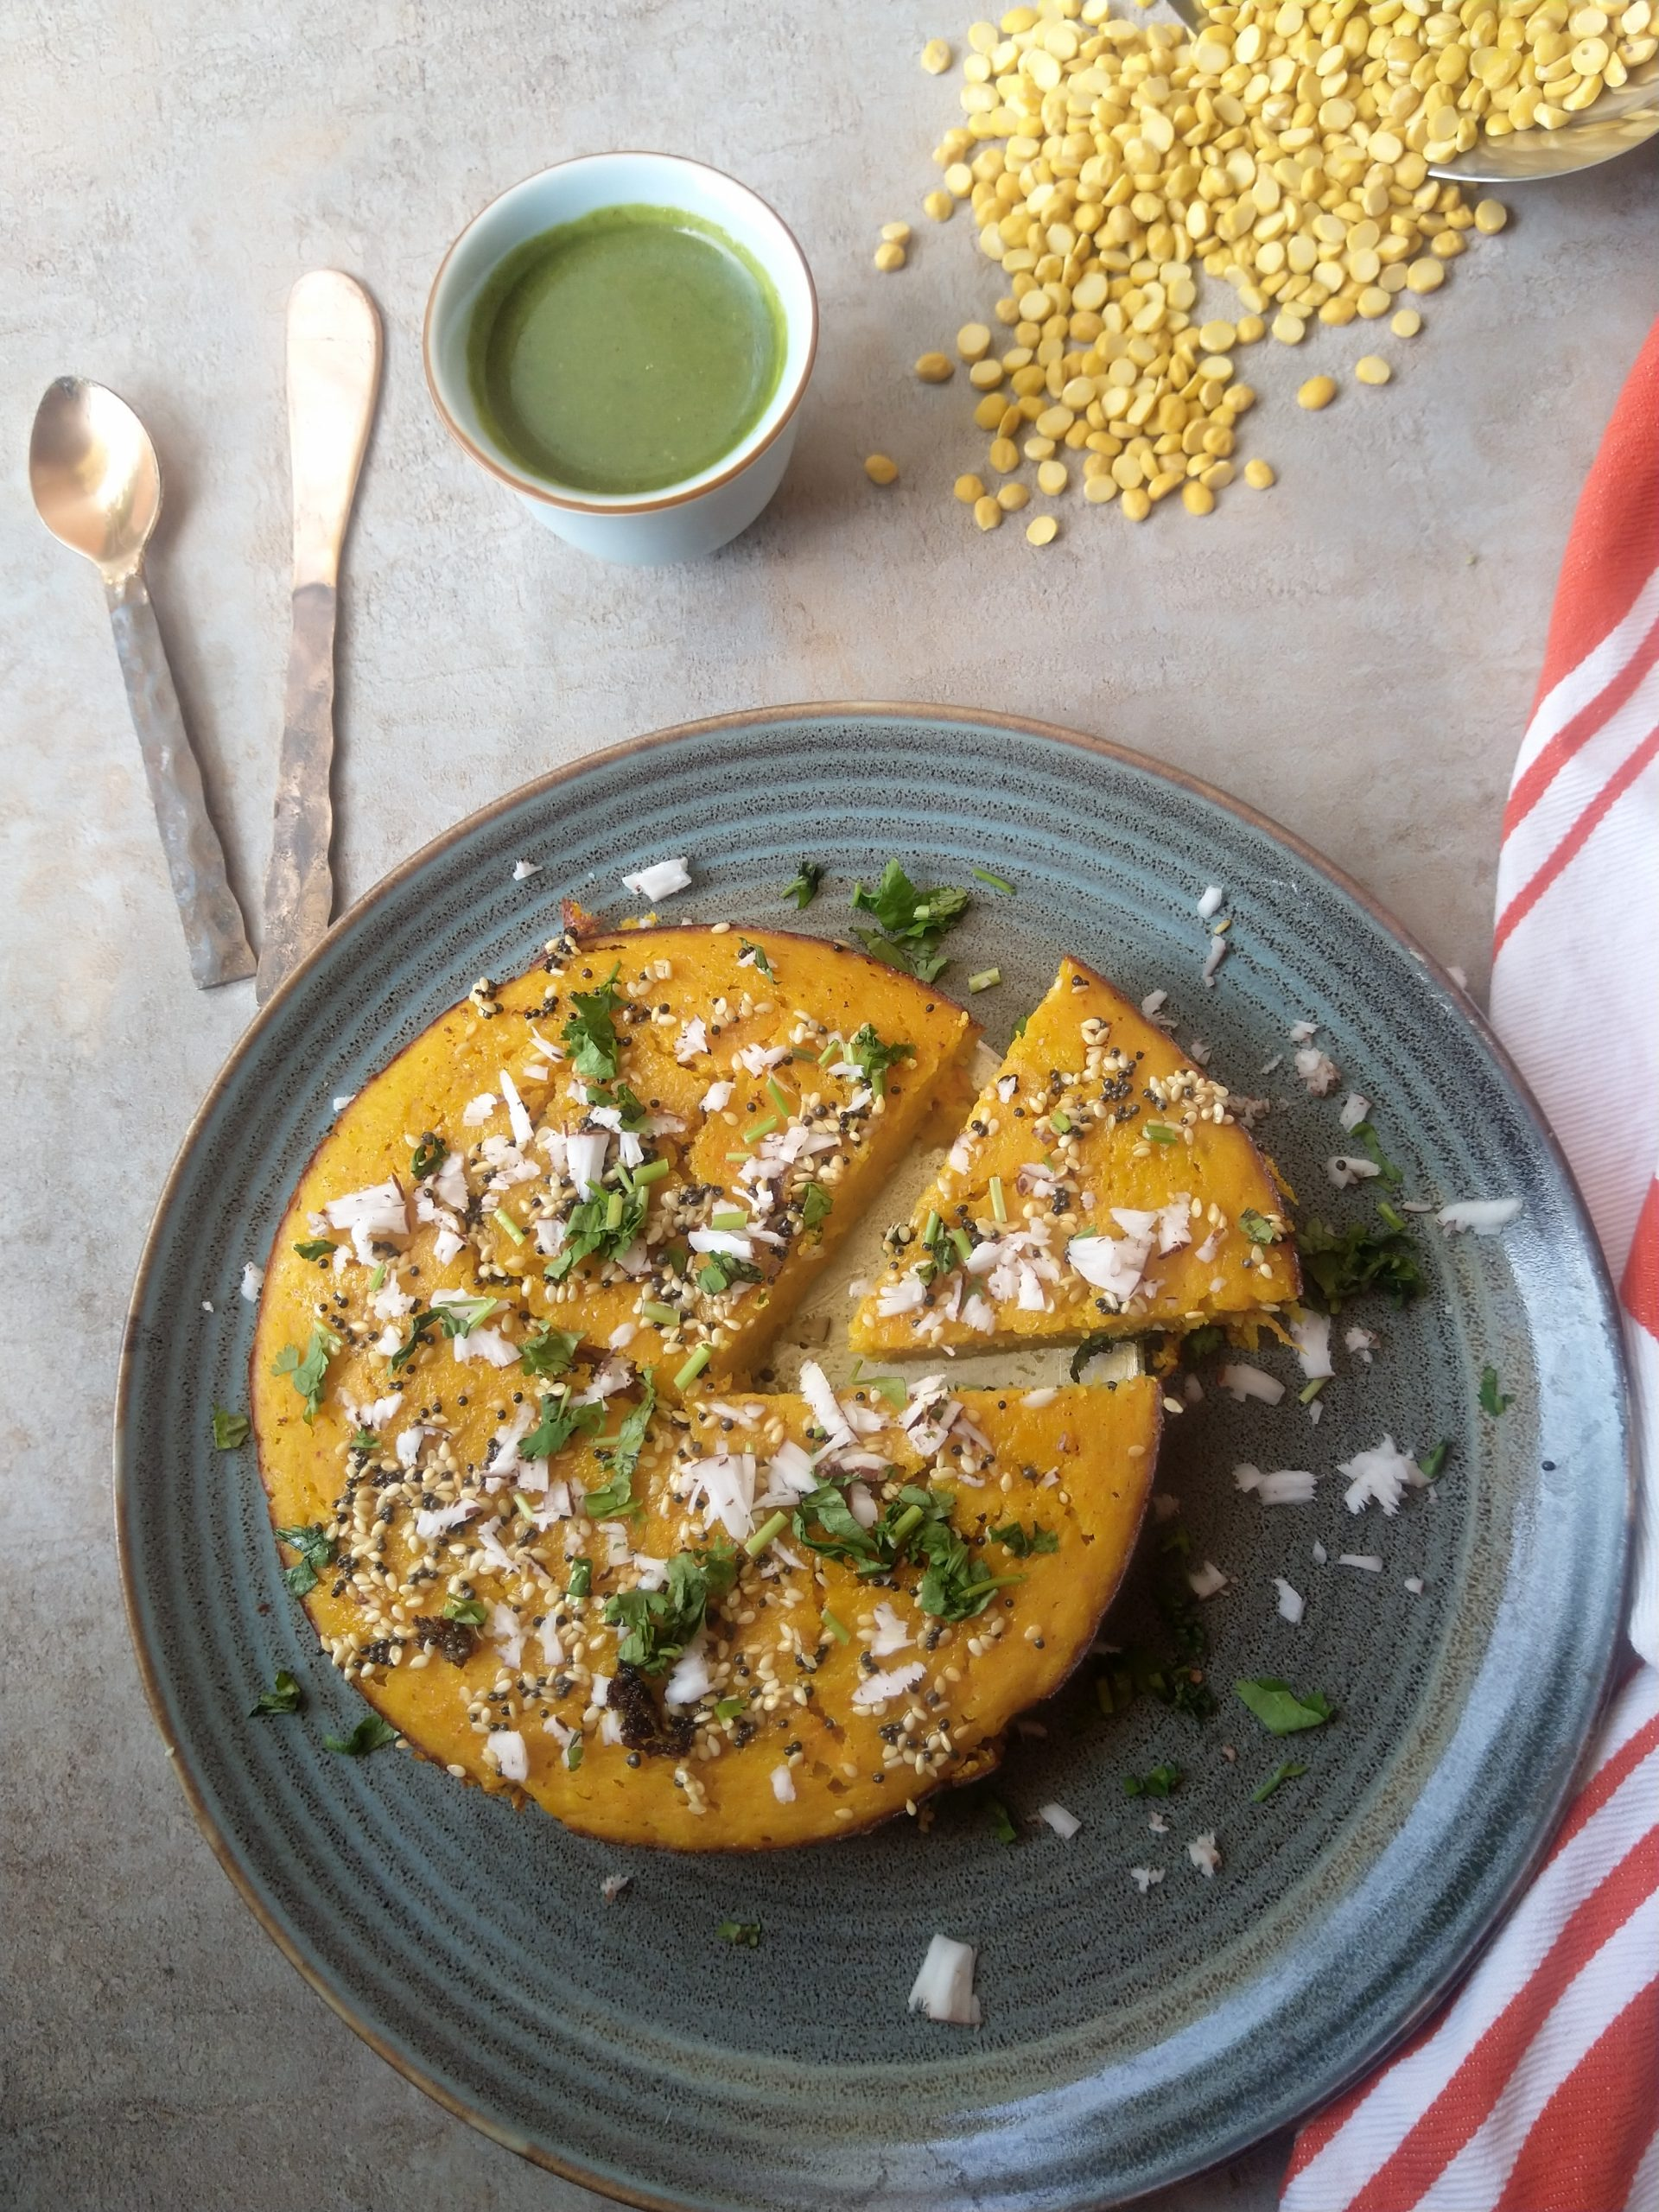 Baked handwo,traditional Gujarati handwo,Savoury rice and vegetable pancake,